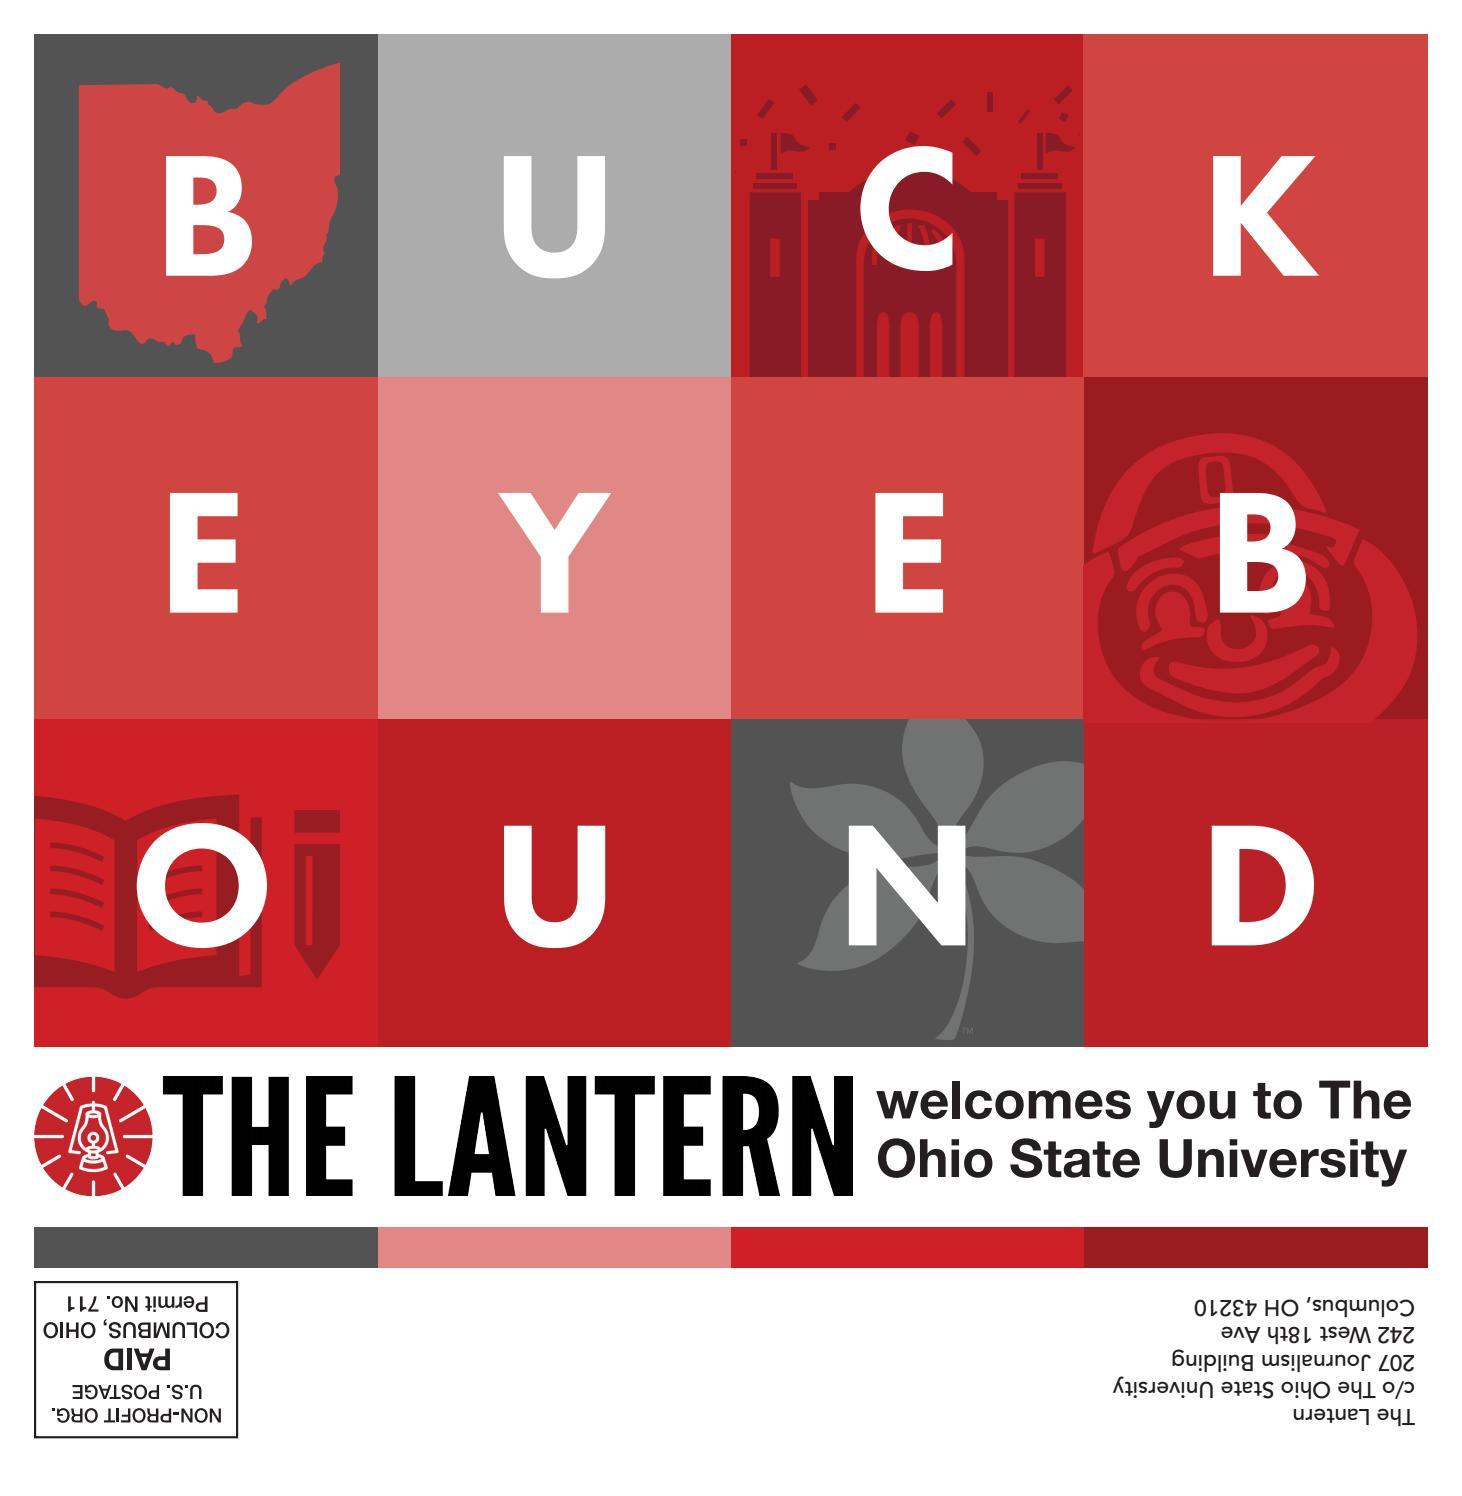 c1c318bfbcc298 The Lantern - August 2 2017 by The Lantern - issuu